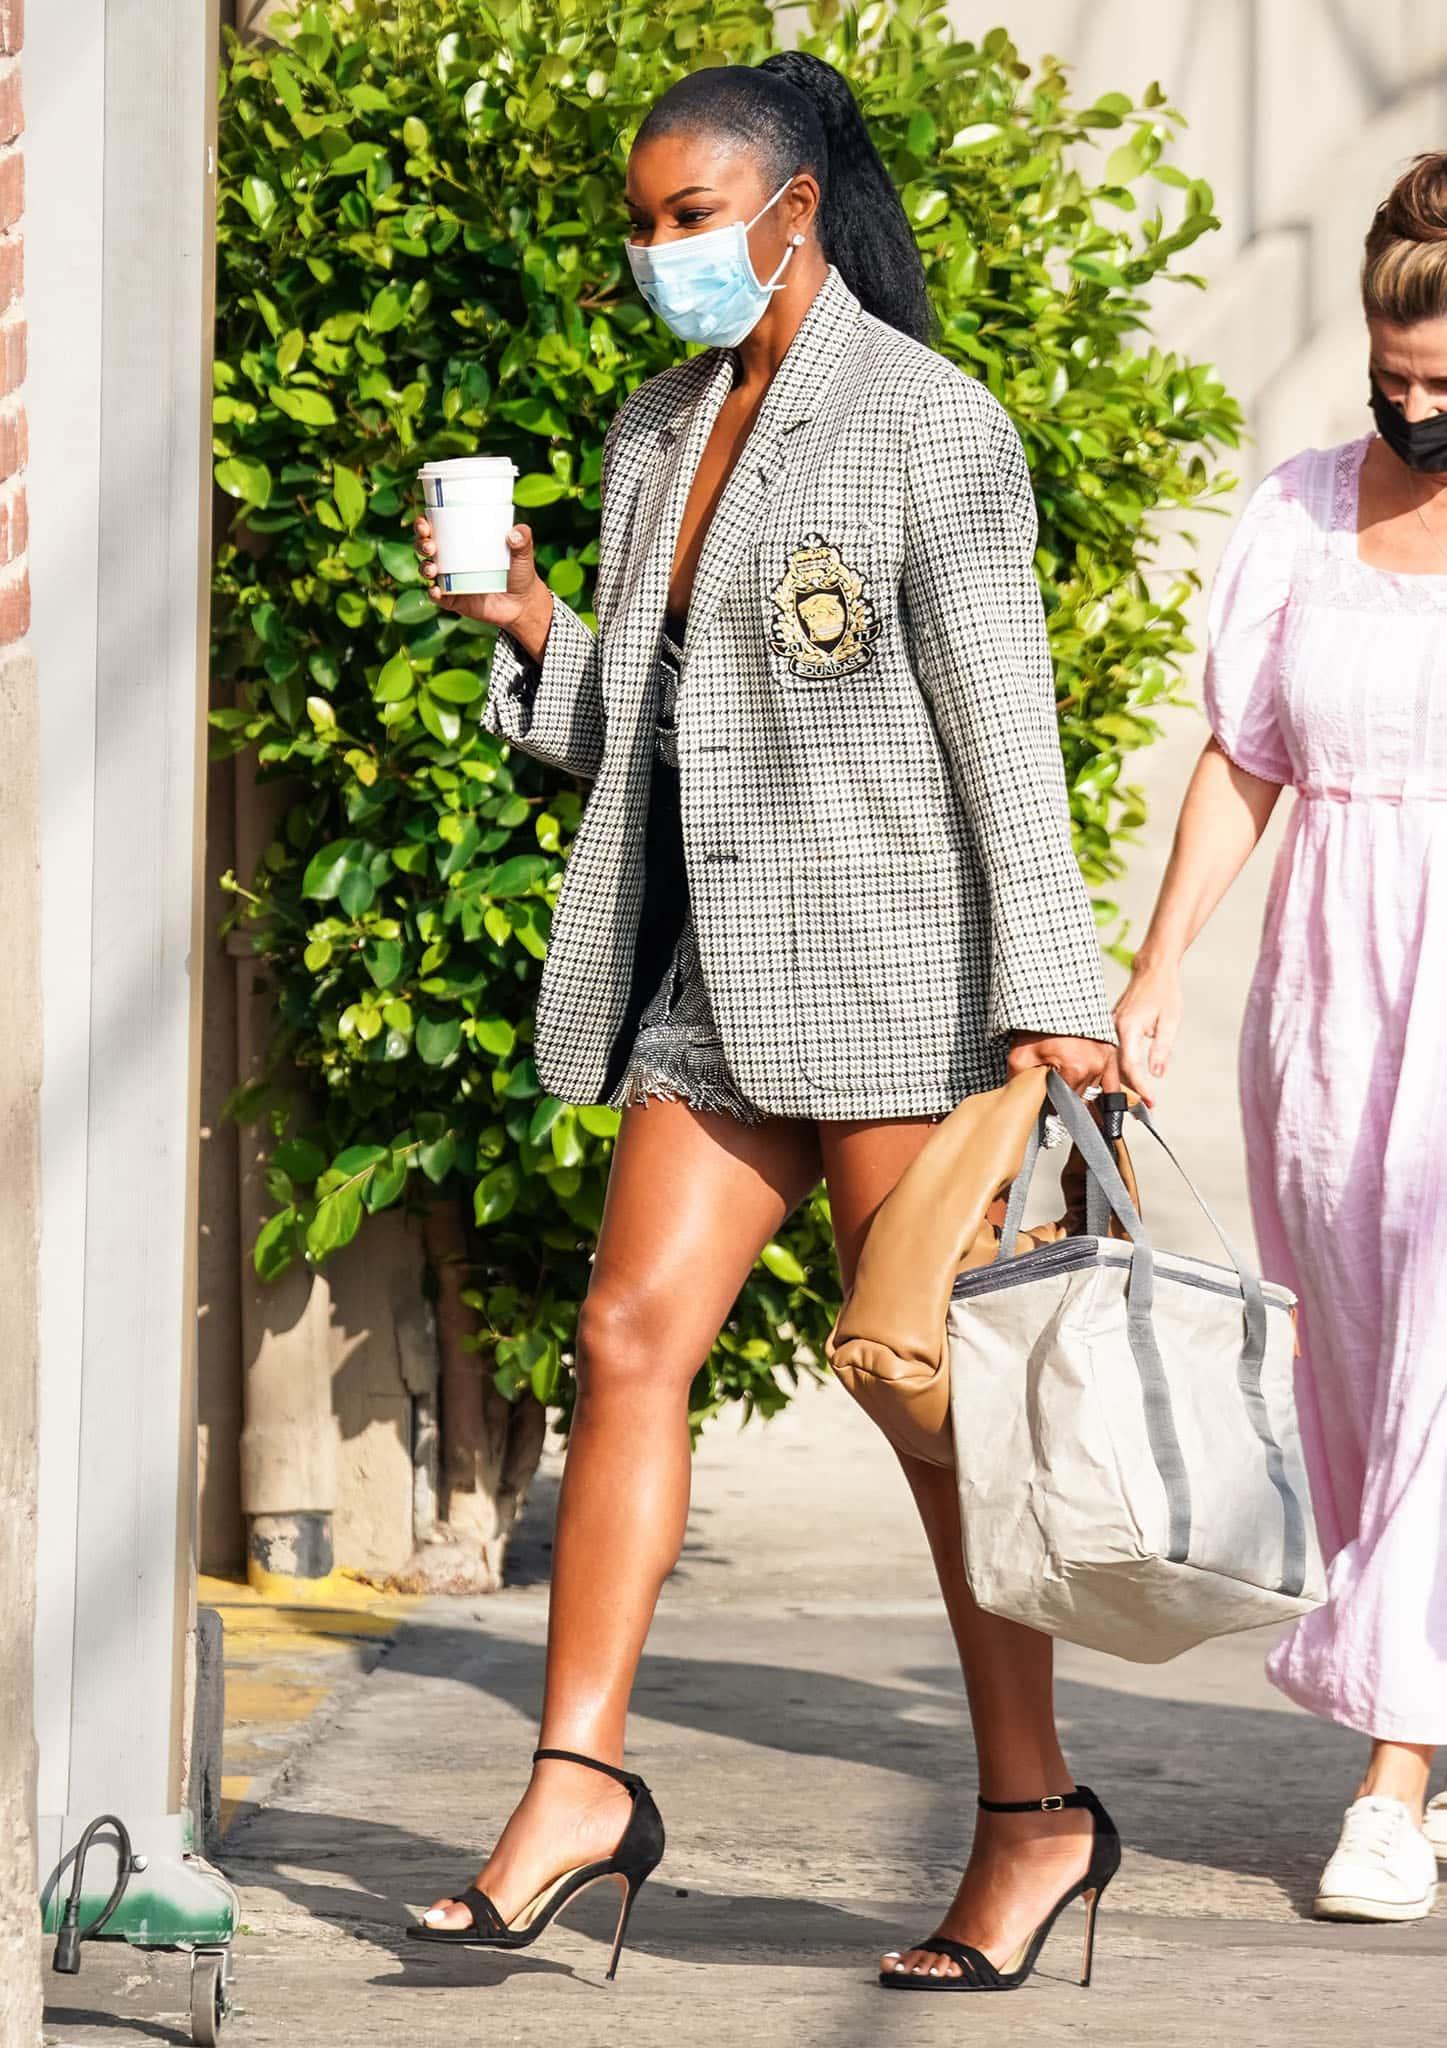 Gabrielle Union arriving at Jimmy Kimmel Live studios on September 28, 2021